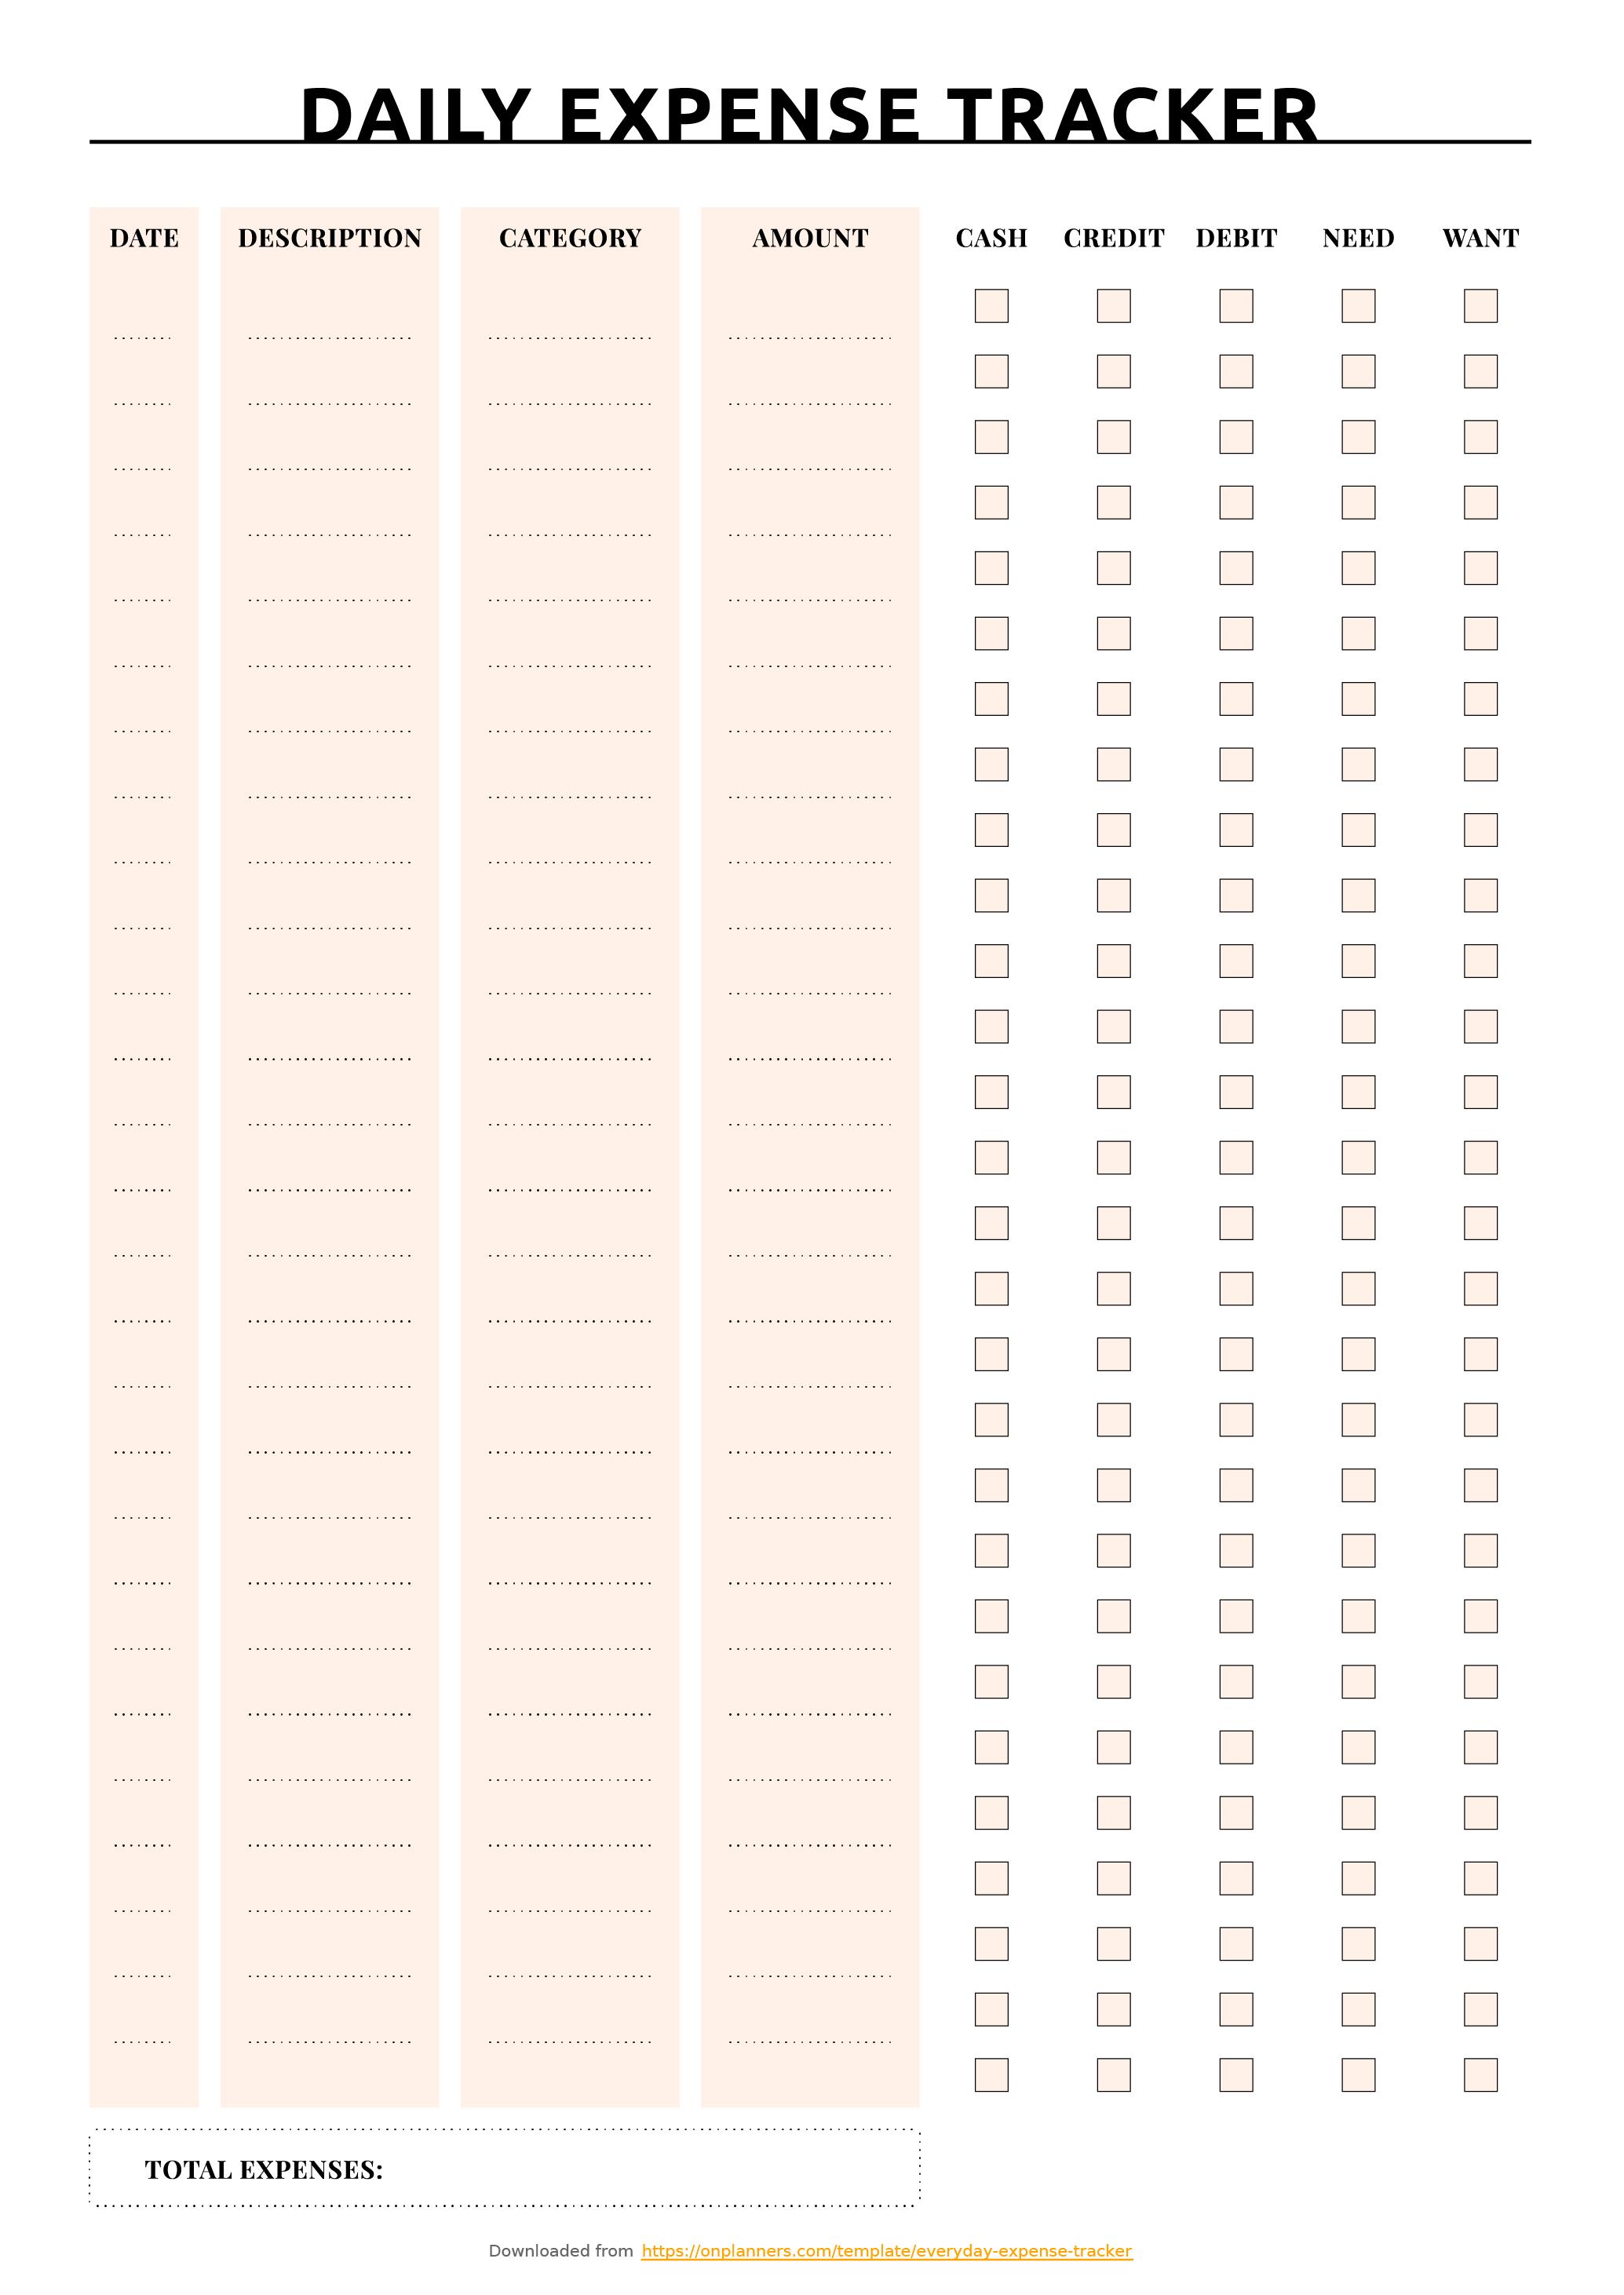 Free Printable Everyday Expense Tracker Pdf Download - Free Printable Daily Expense Tracker